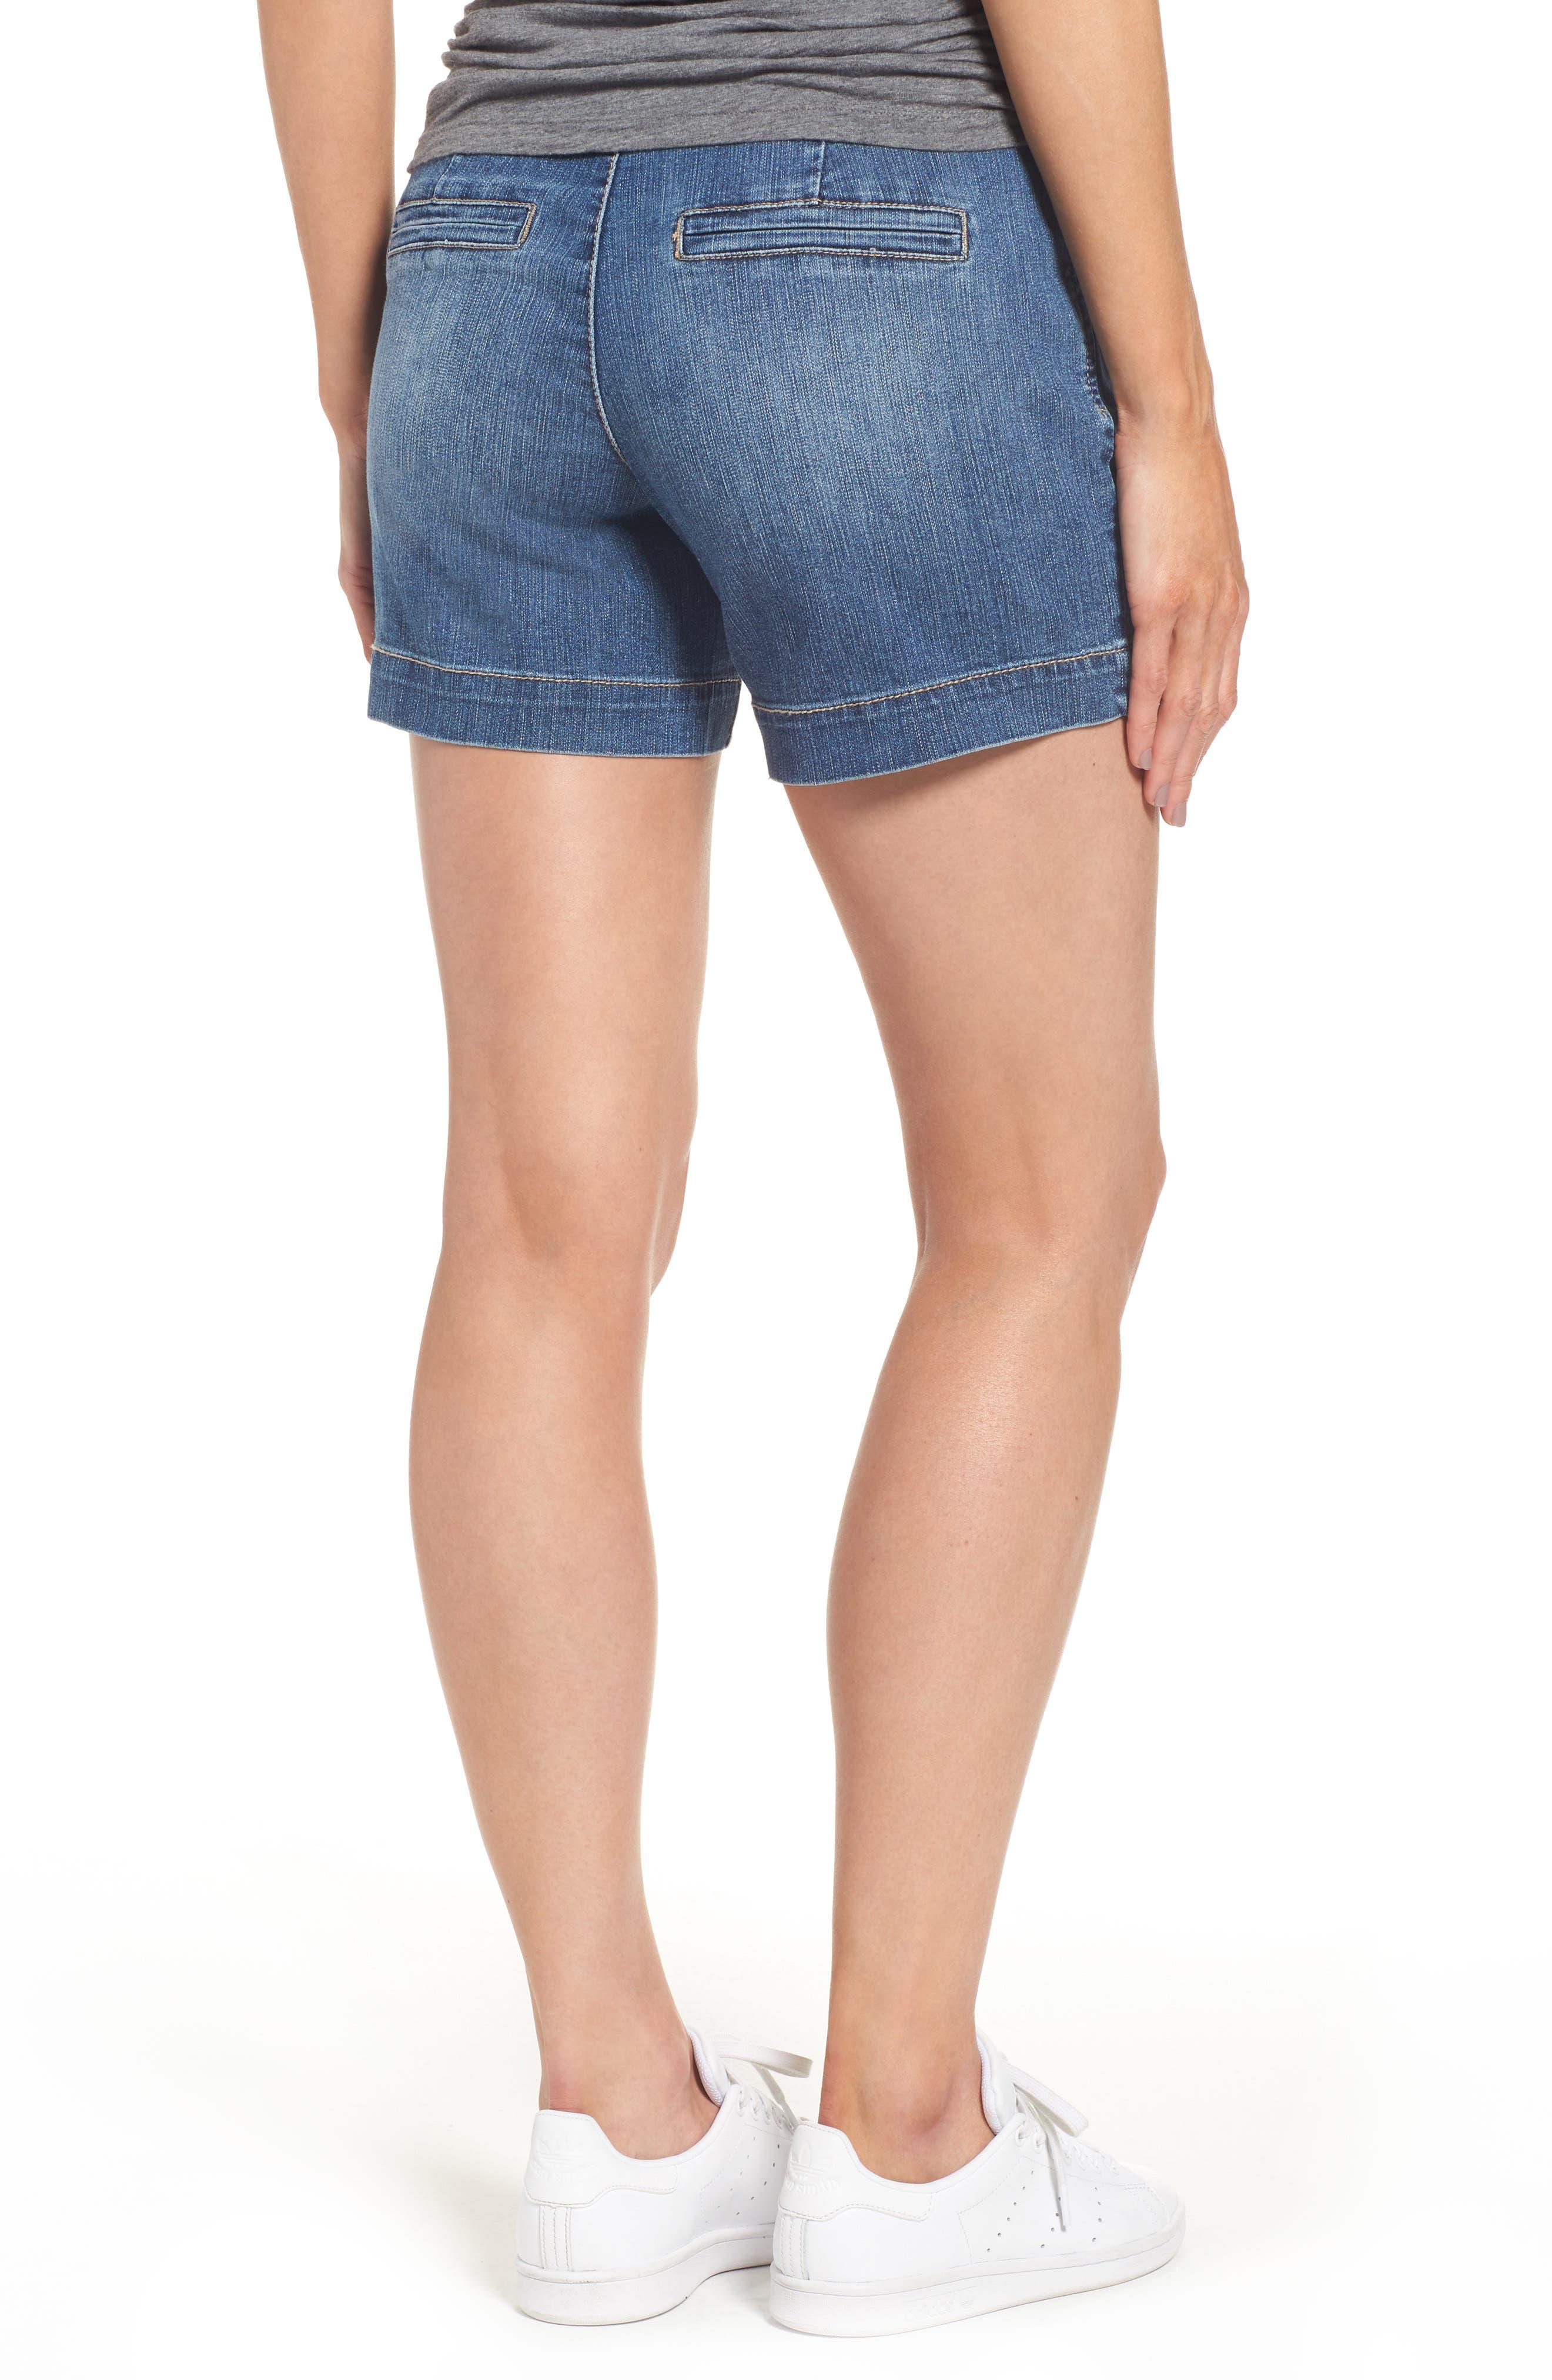 Ainsley Pull-On Denim Shorts,                             Alternate thumbnail 2, color,                             402